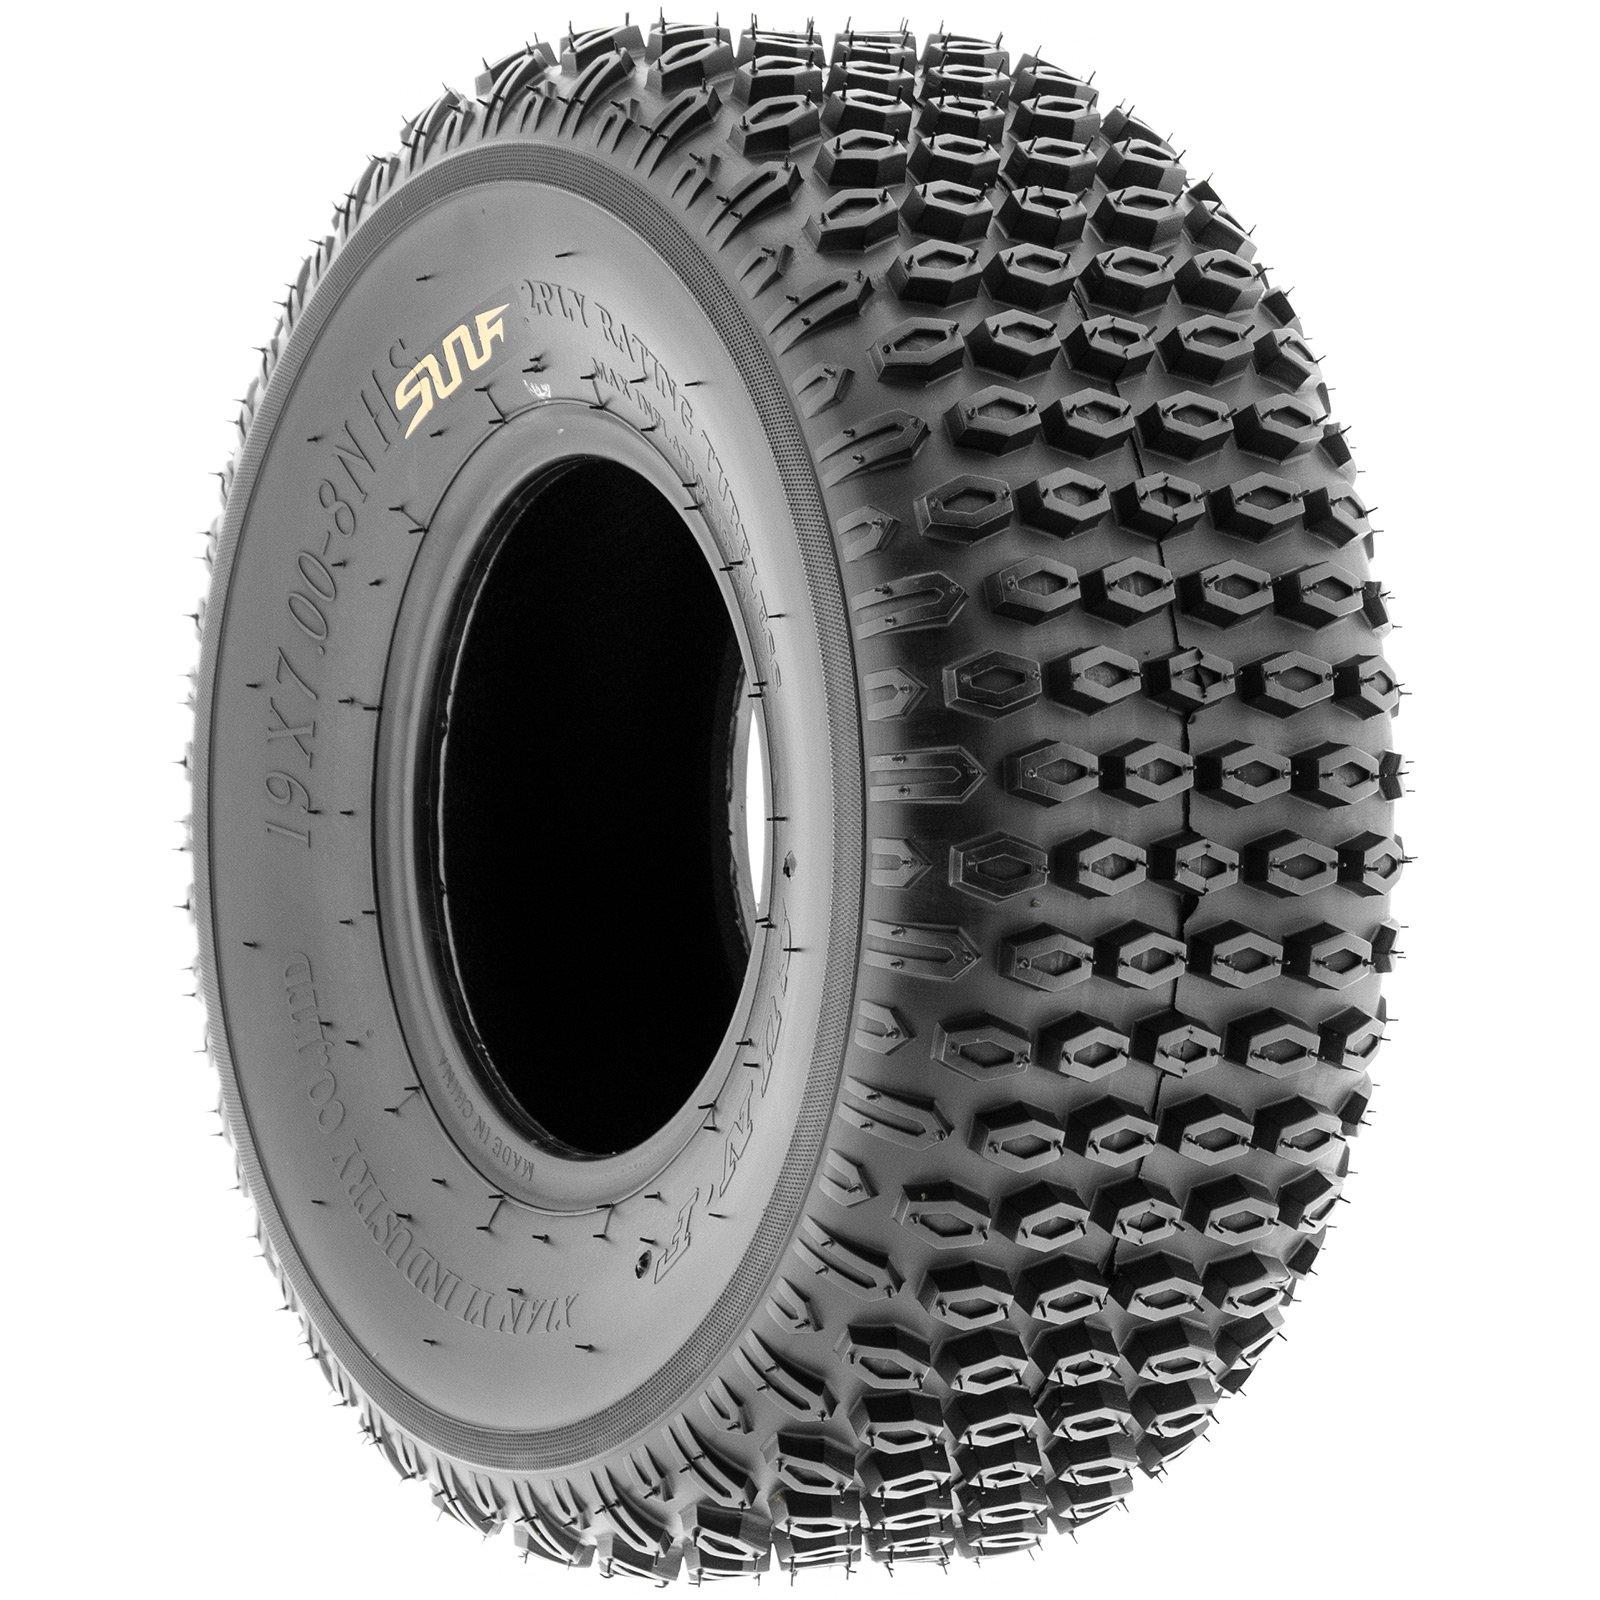 SunF Quad ATV Sport Tires 16x8-7 16x8x7 4 PR A012 (Full set of 4) by SunF (Image #5)